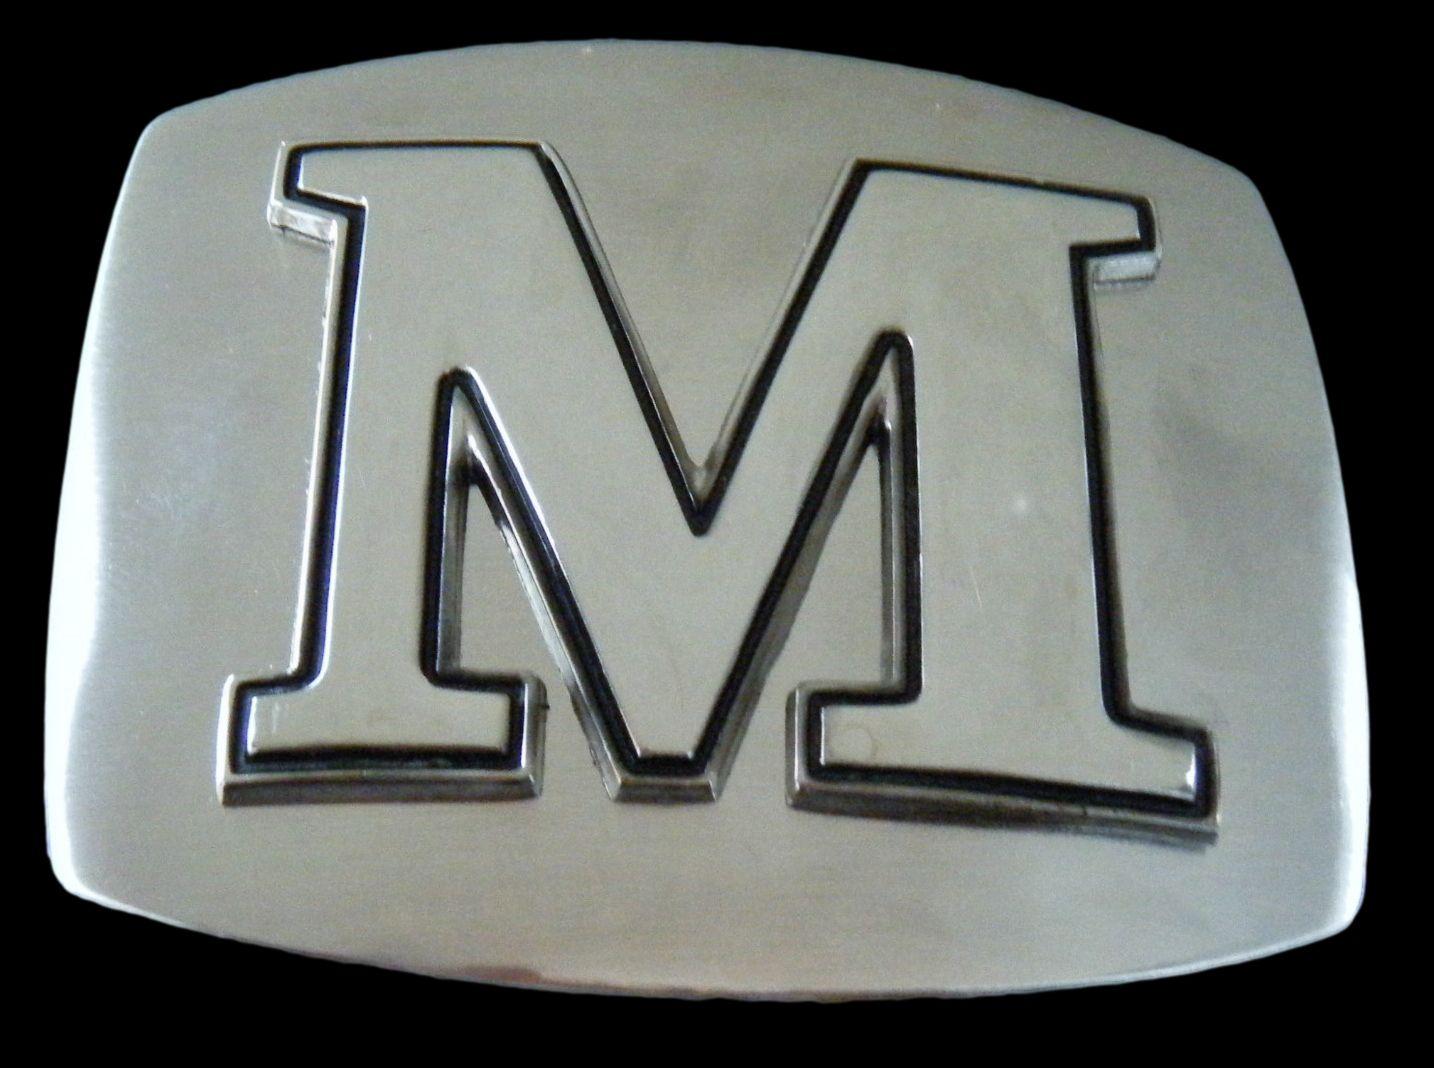 Initial Letter Name M Chrome Belt Buckle Belts Buckles Belt Buckles Initial Belt Buckle Cool Belt Buckles